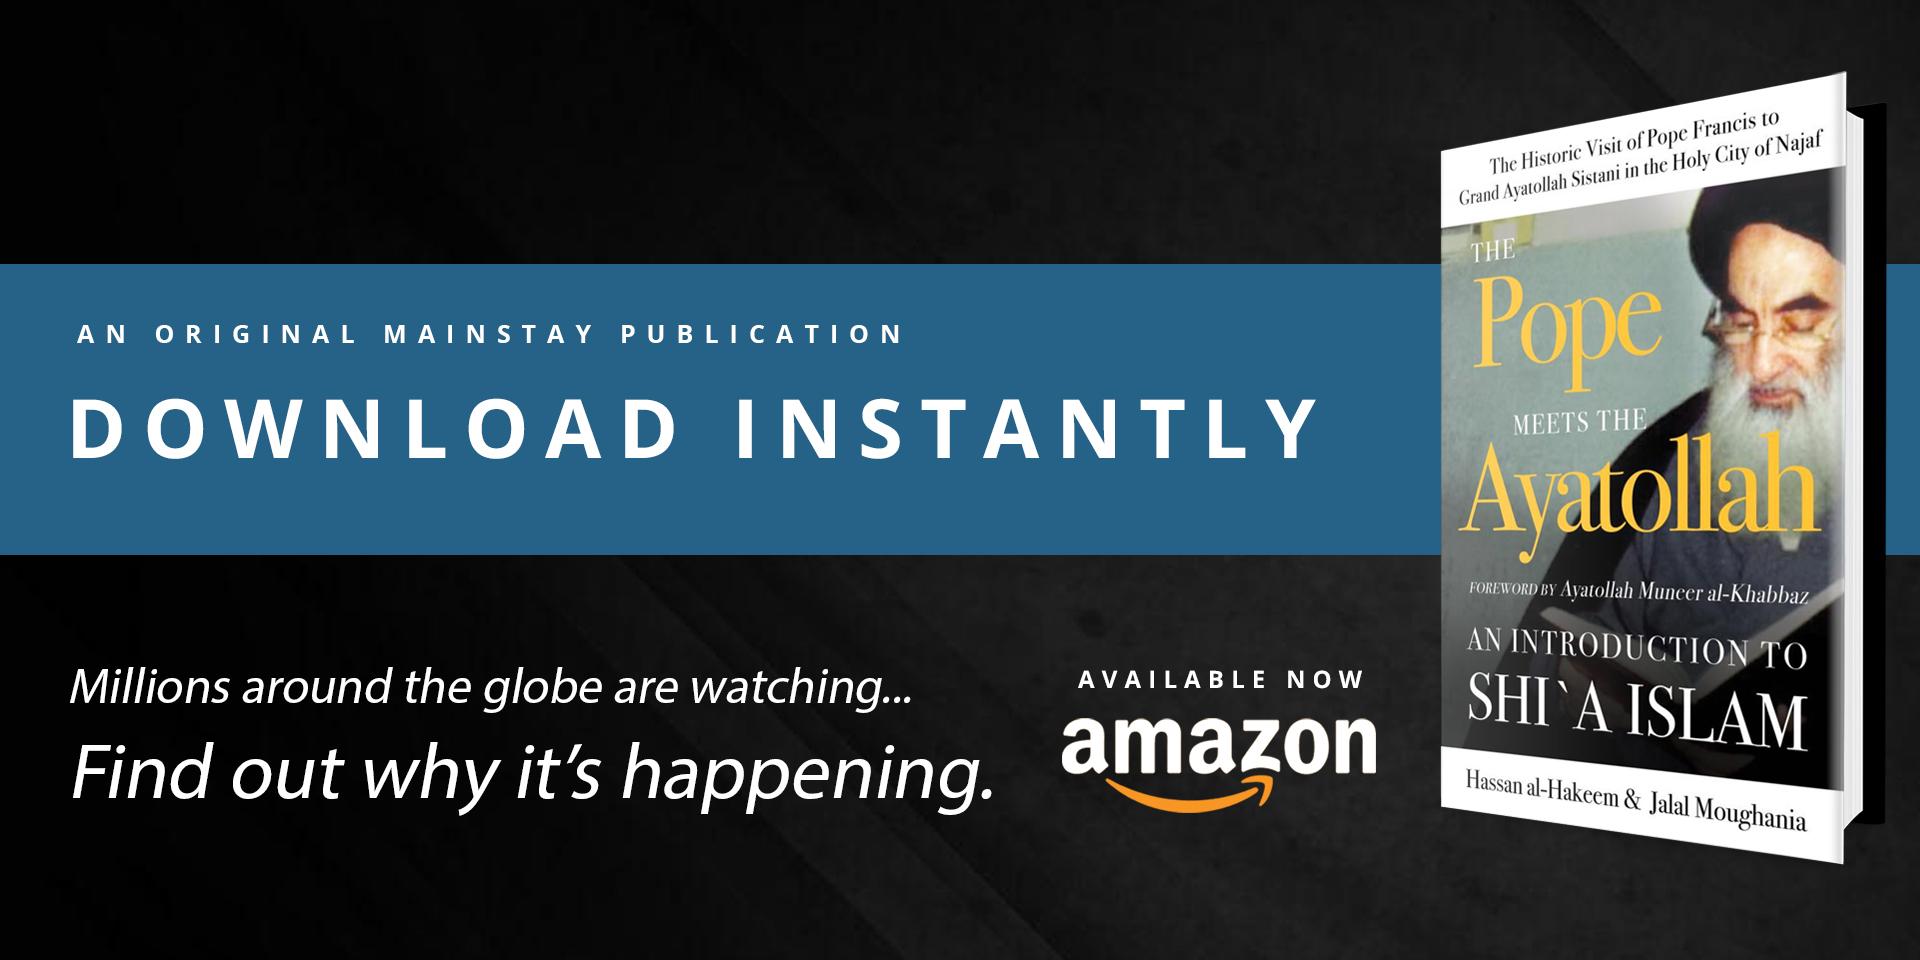 Book Release on Amazon!